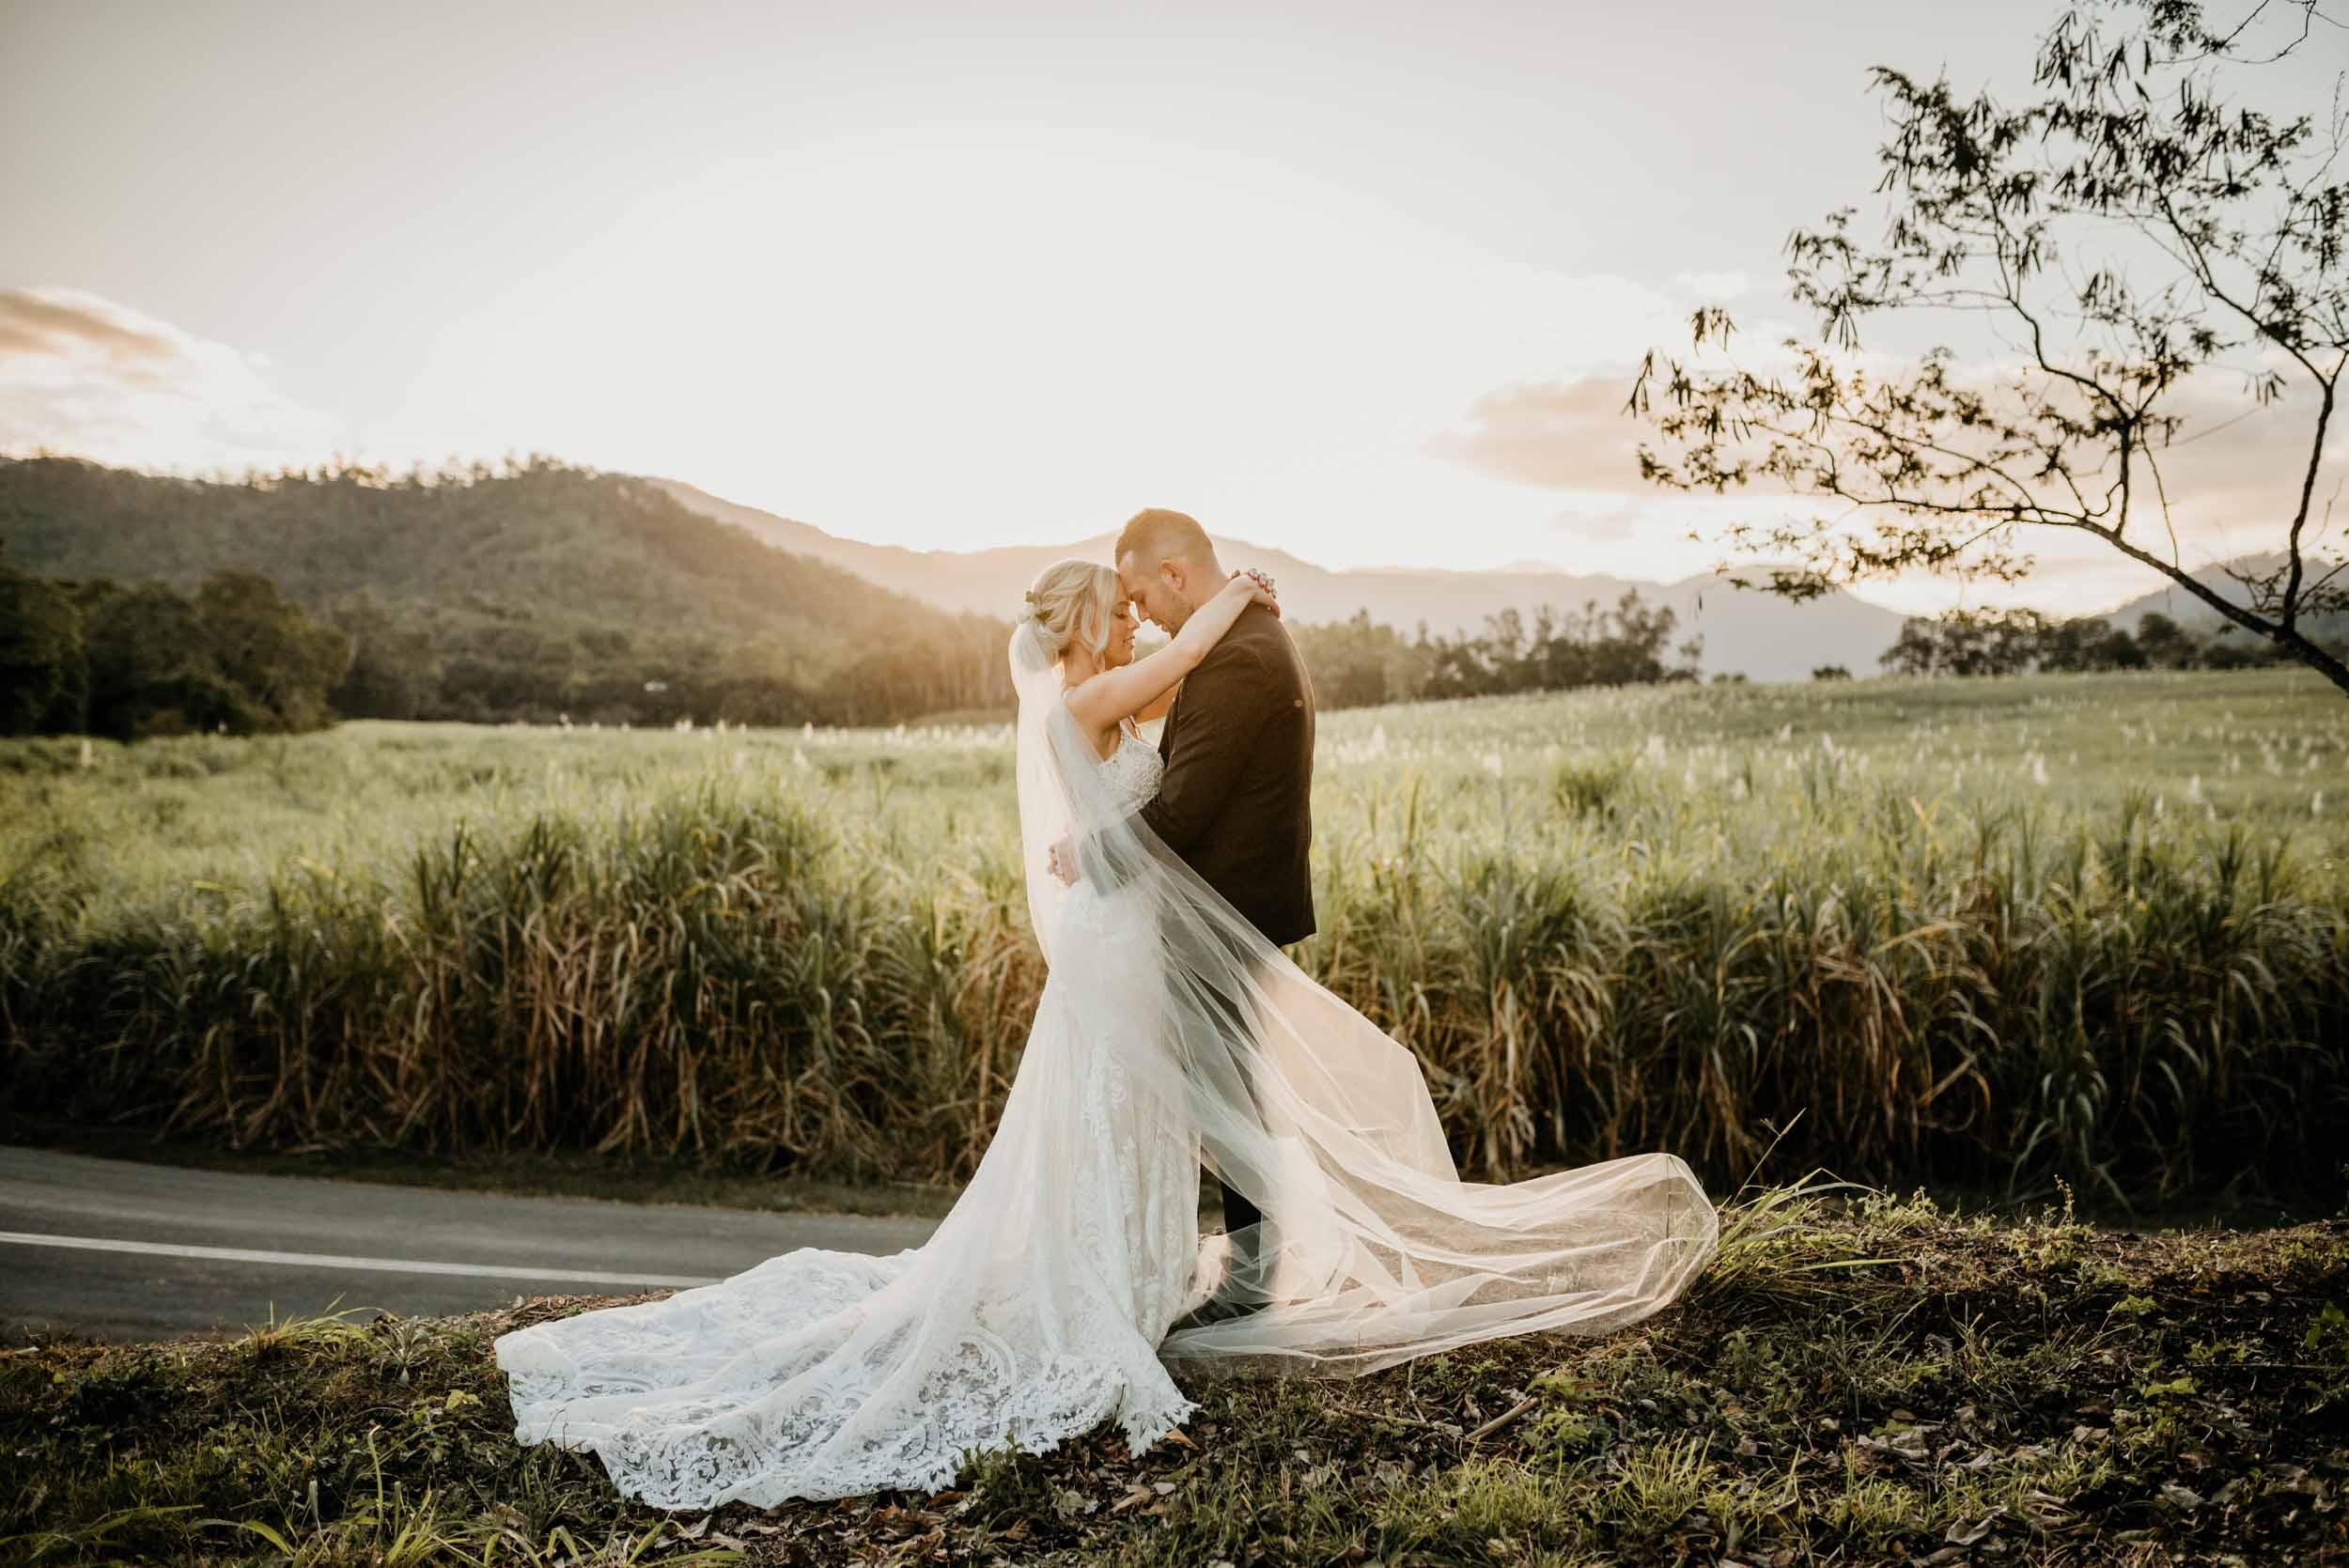 The Raw Photographer - Cairns Wedding Photographer - Port Douglas - Wedding Dress - Engaged couple-38.jpg